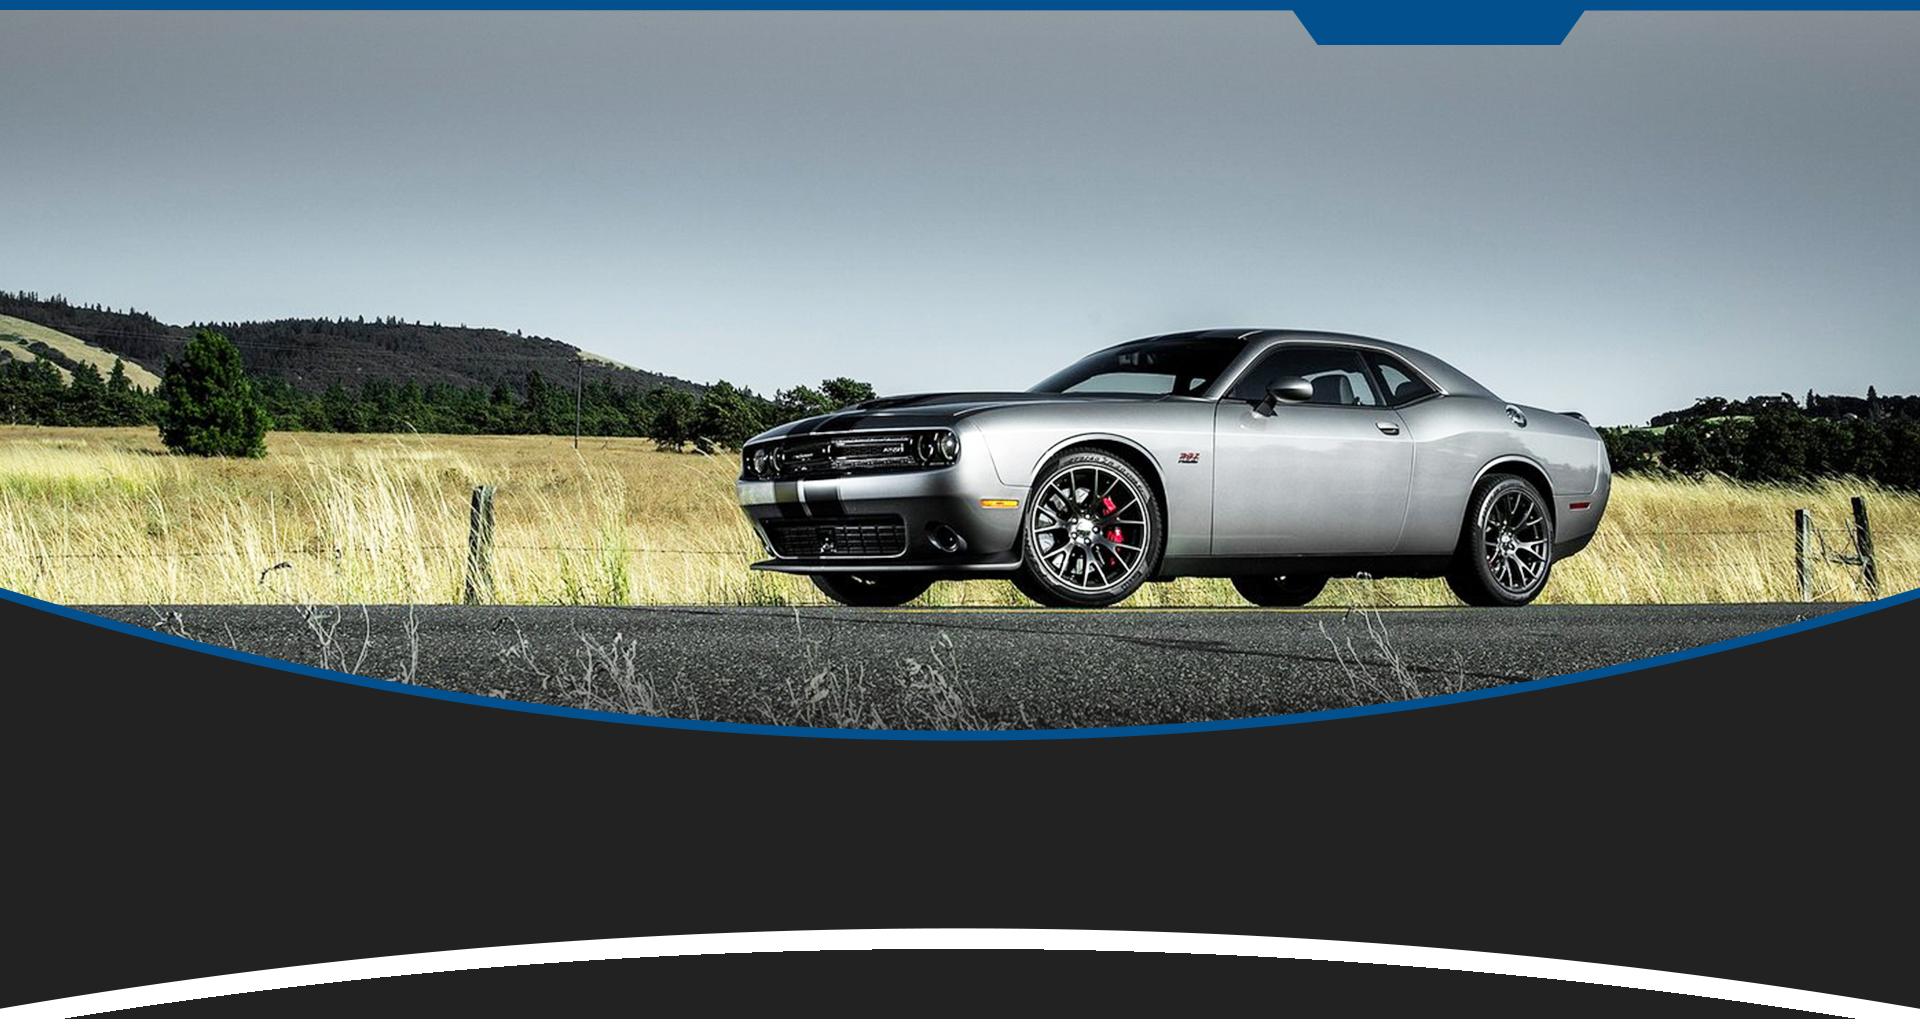 Discount Motors - Used Cars - Pueblo CO Dealer